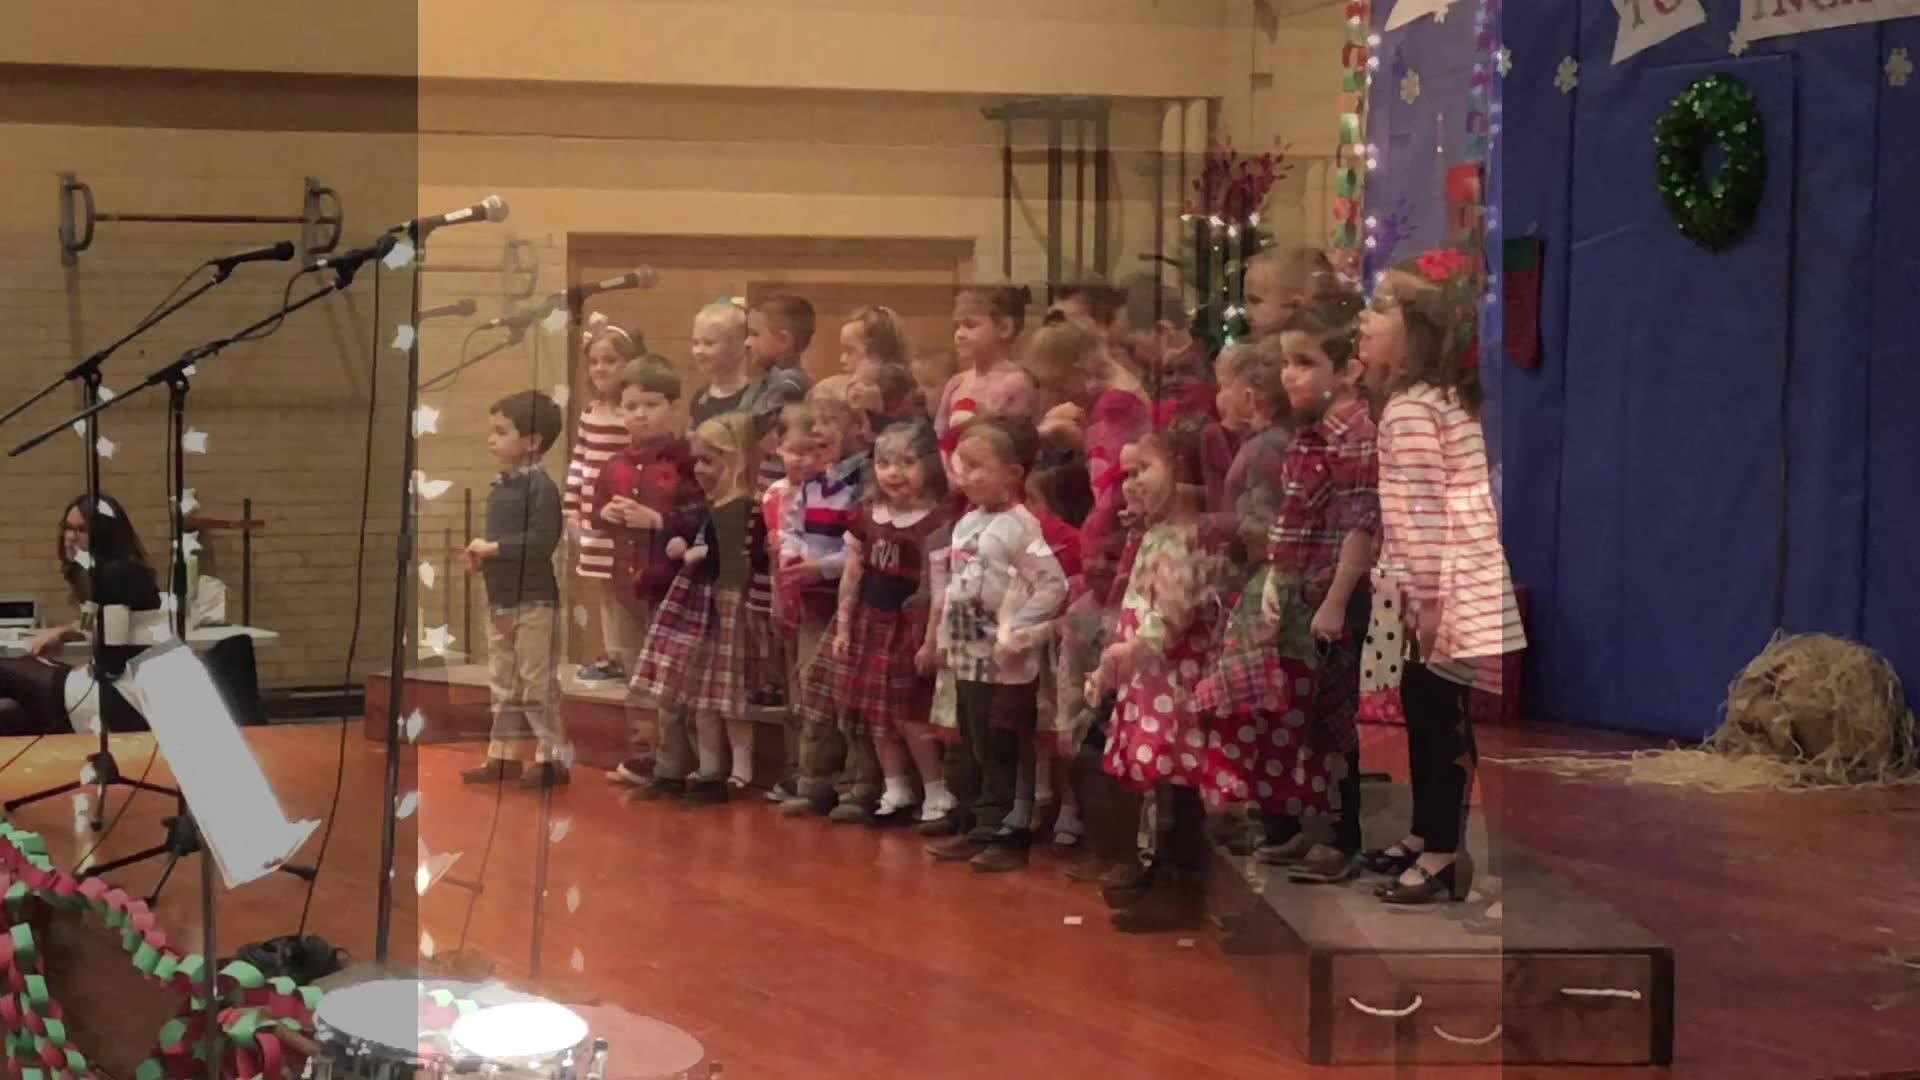 Vivian's Christmas Program 🎄😍. (:35 though 😂 #OnlyViv)